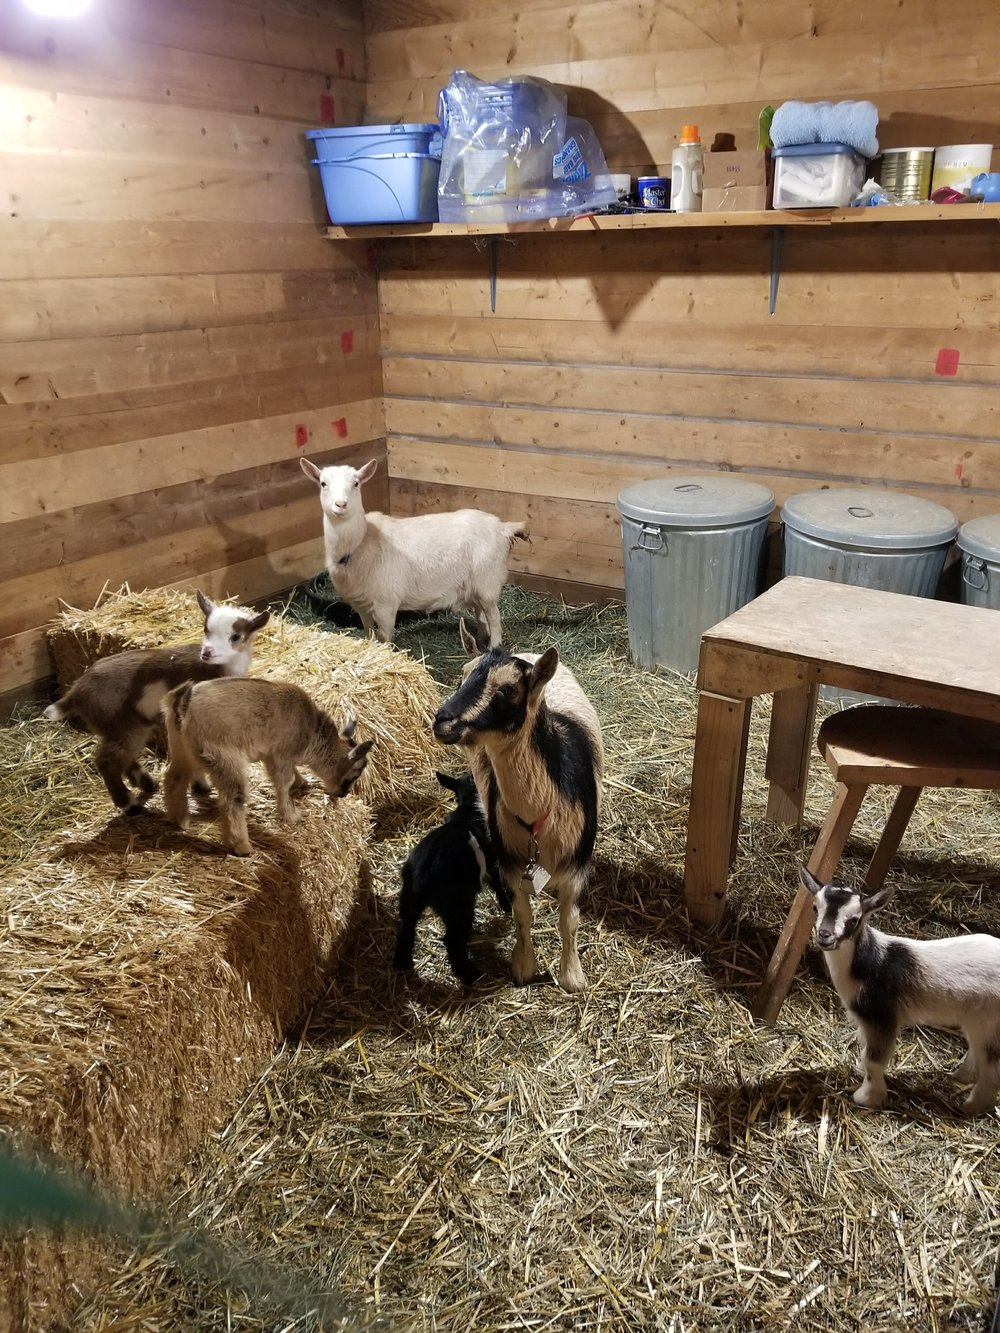 Nigerian Dwarf Goats! Kids are named Angel, Hedgehog, Phobos, and Deimos.